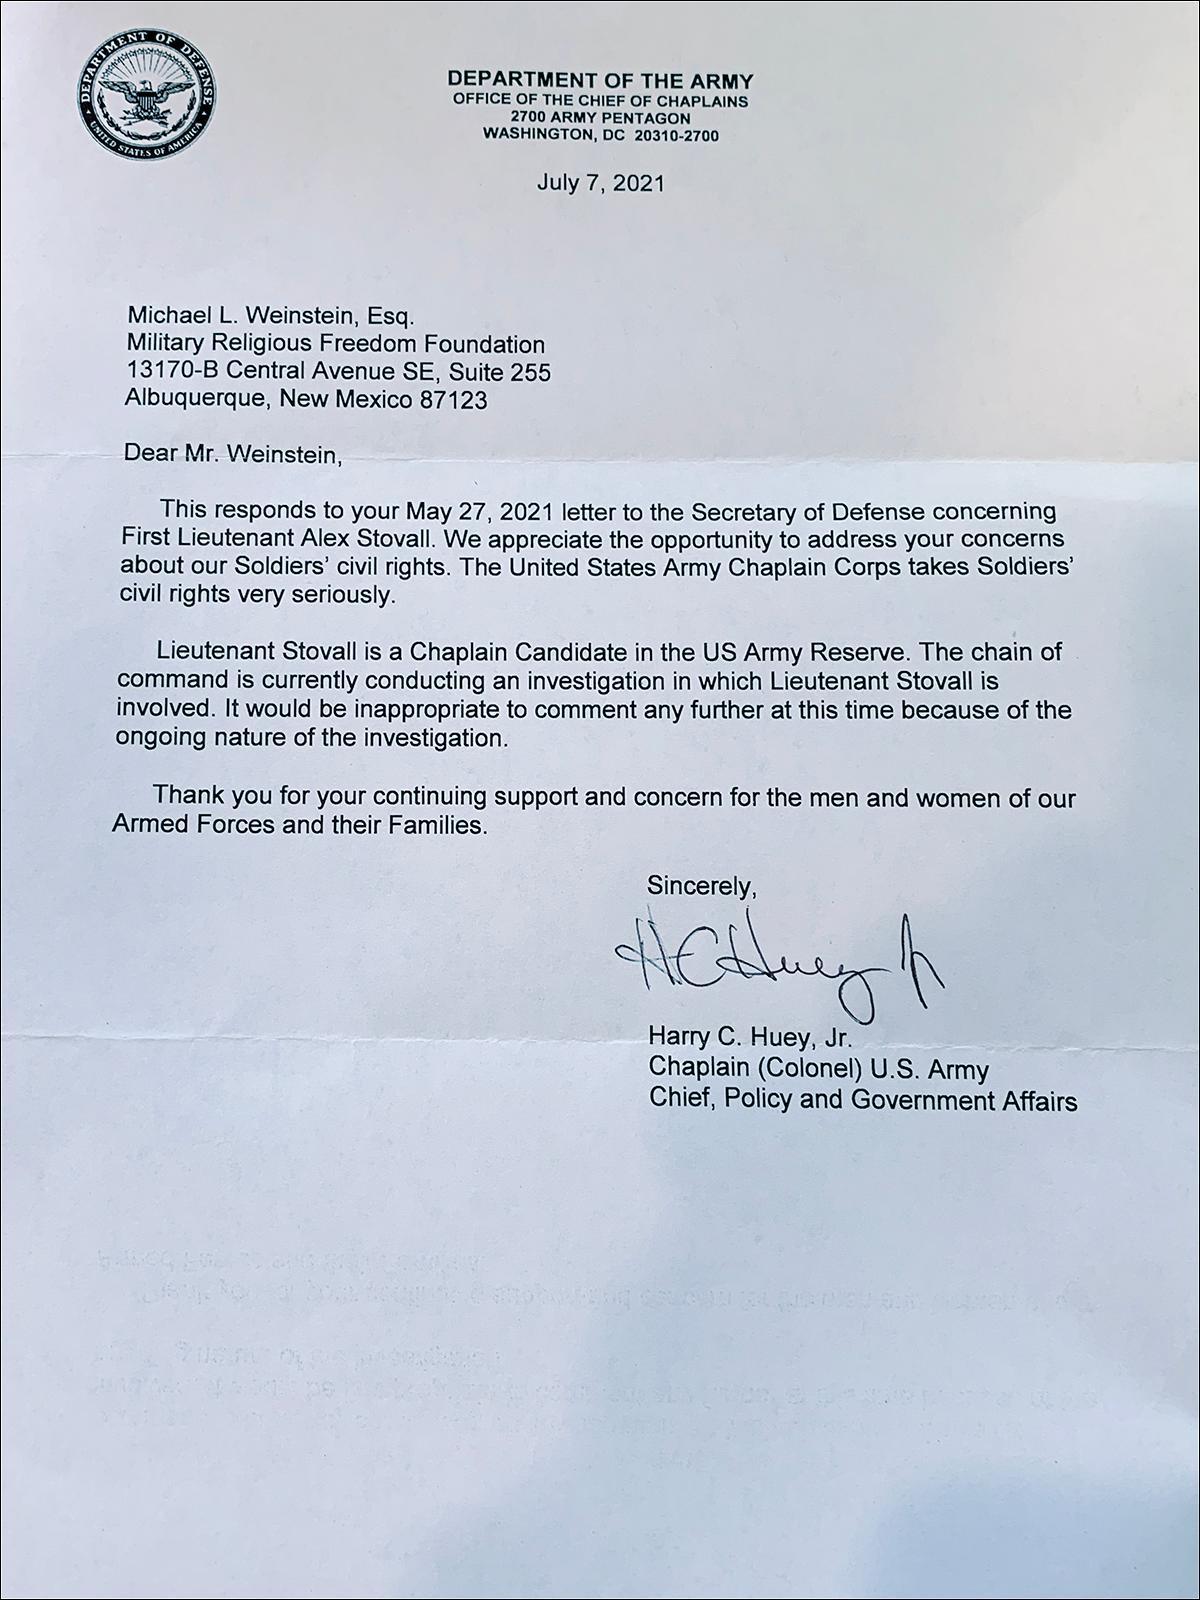 Letter from Pentagon regarding Alex Stovall